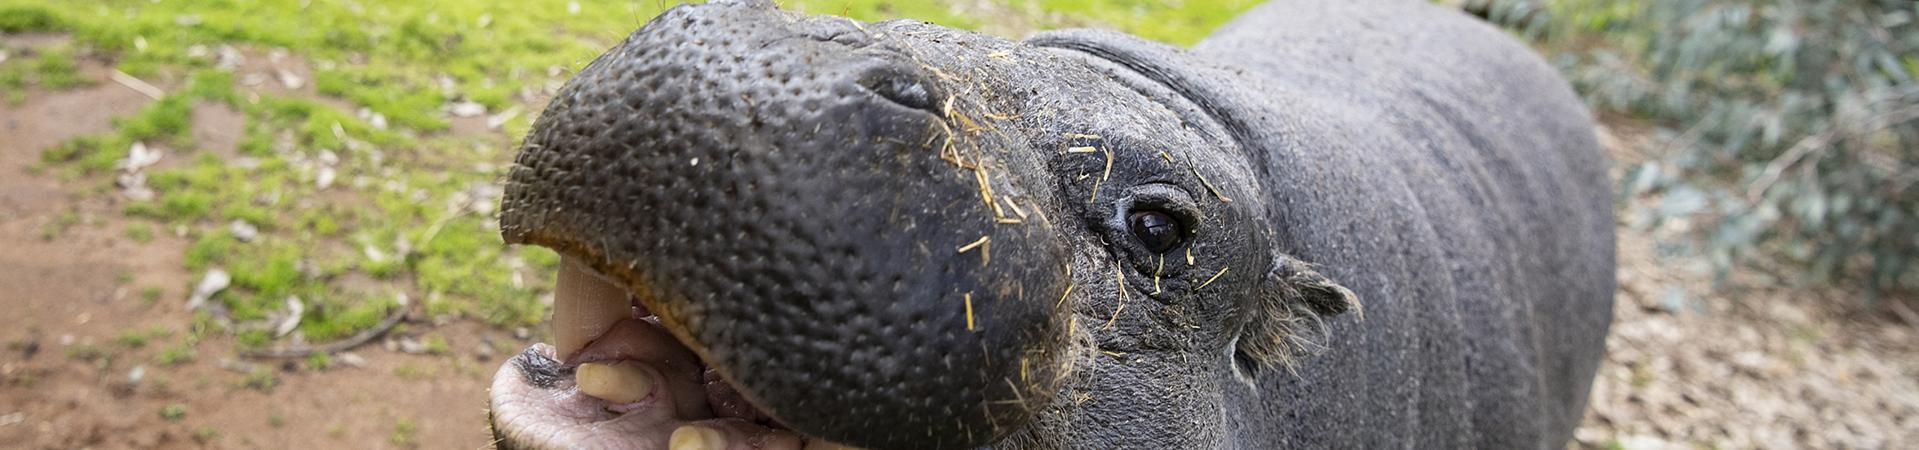 Hanna Shirley, Project Wildlife, Hippo.